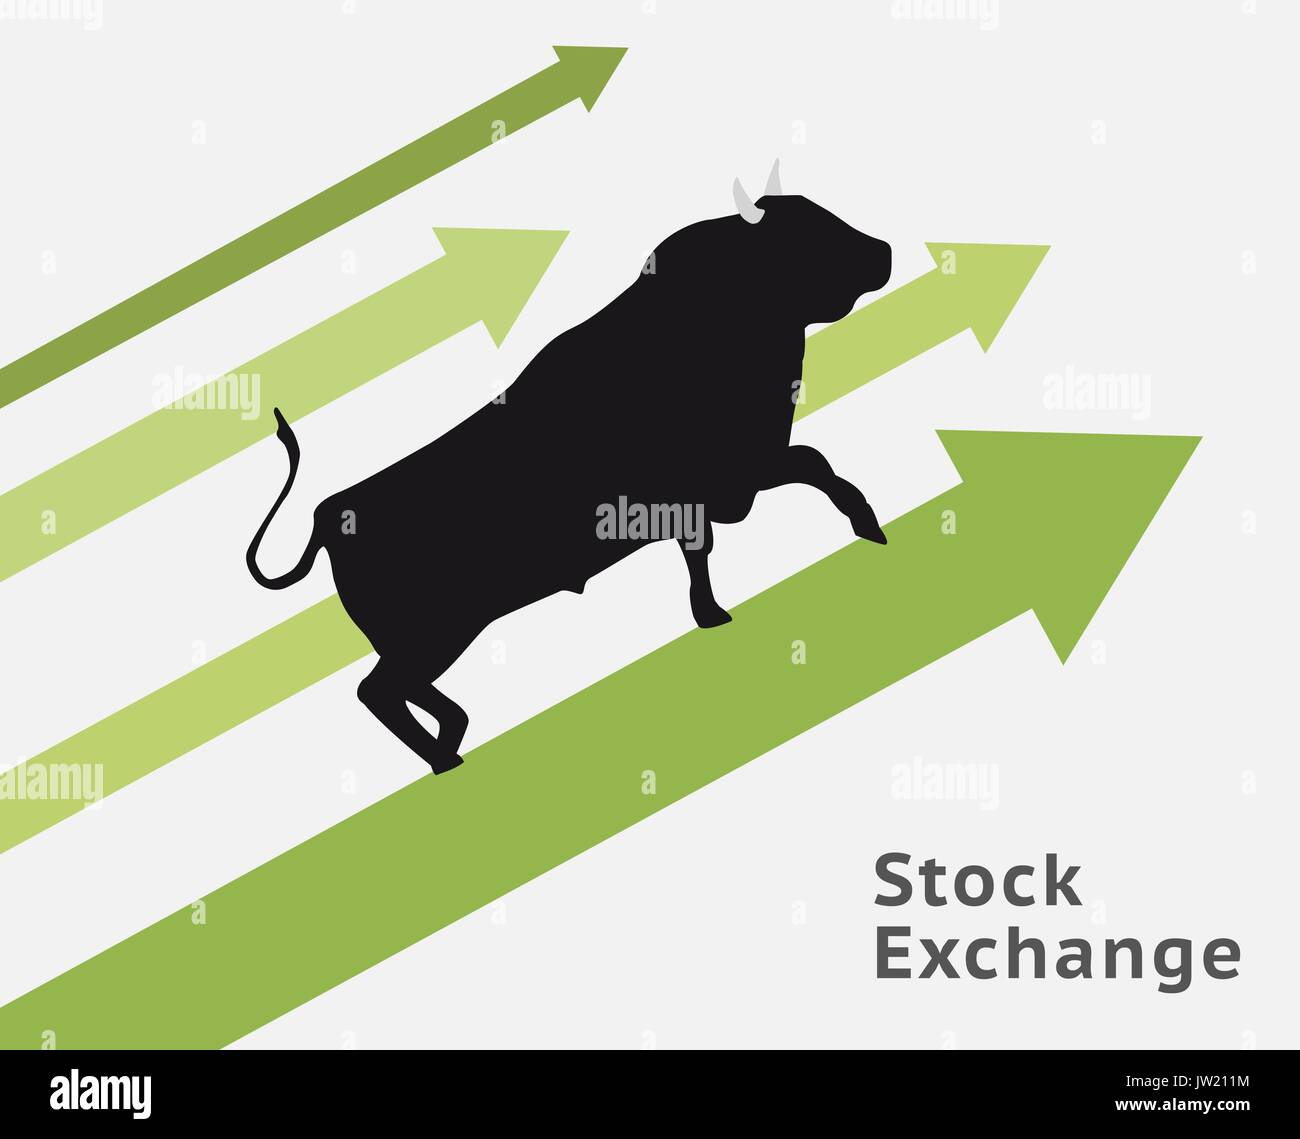 Bull stock concept raising up. Making profit. - Stock Image